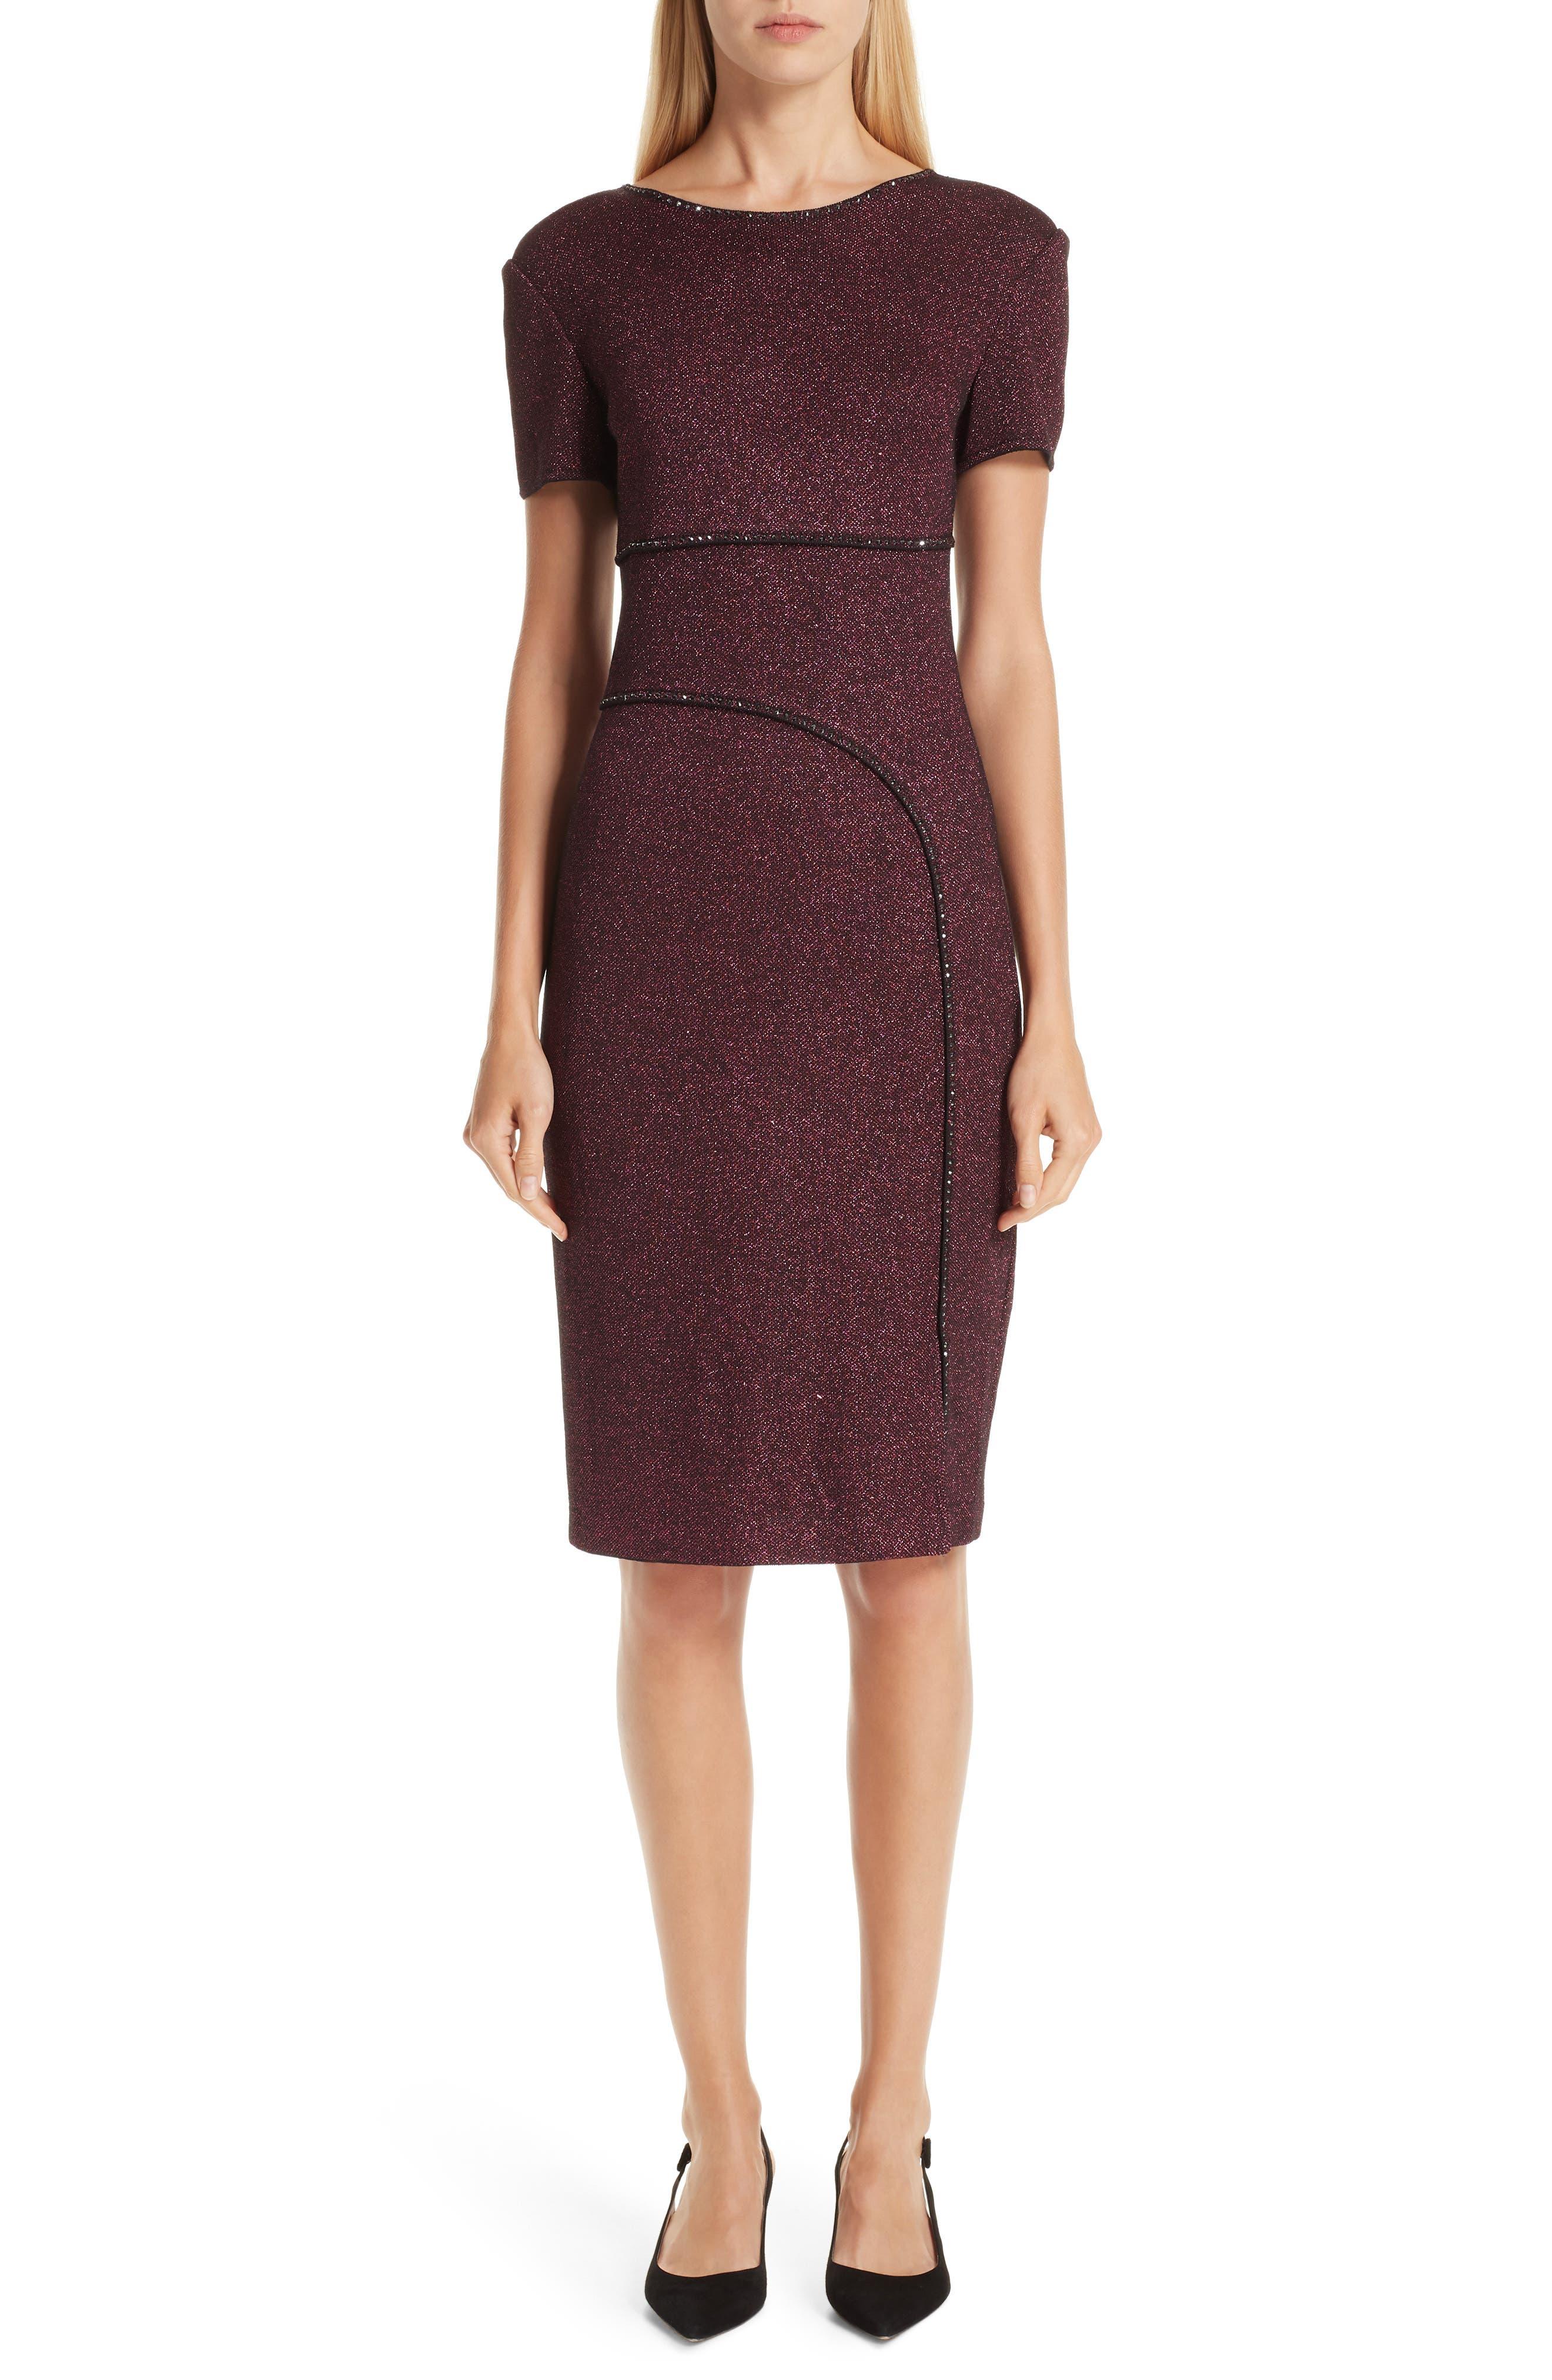 St. John Collection Mod Metallic Knit Sheath Dress, Pink